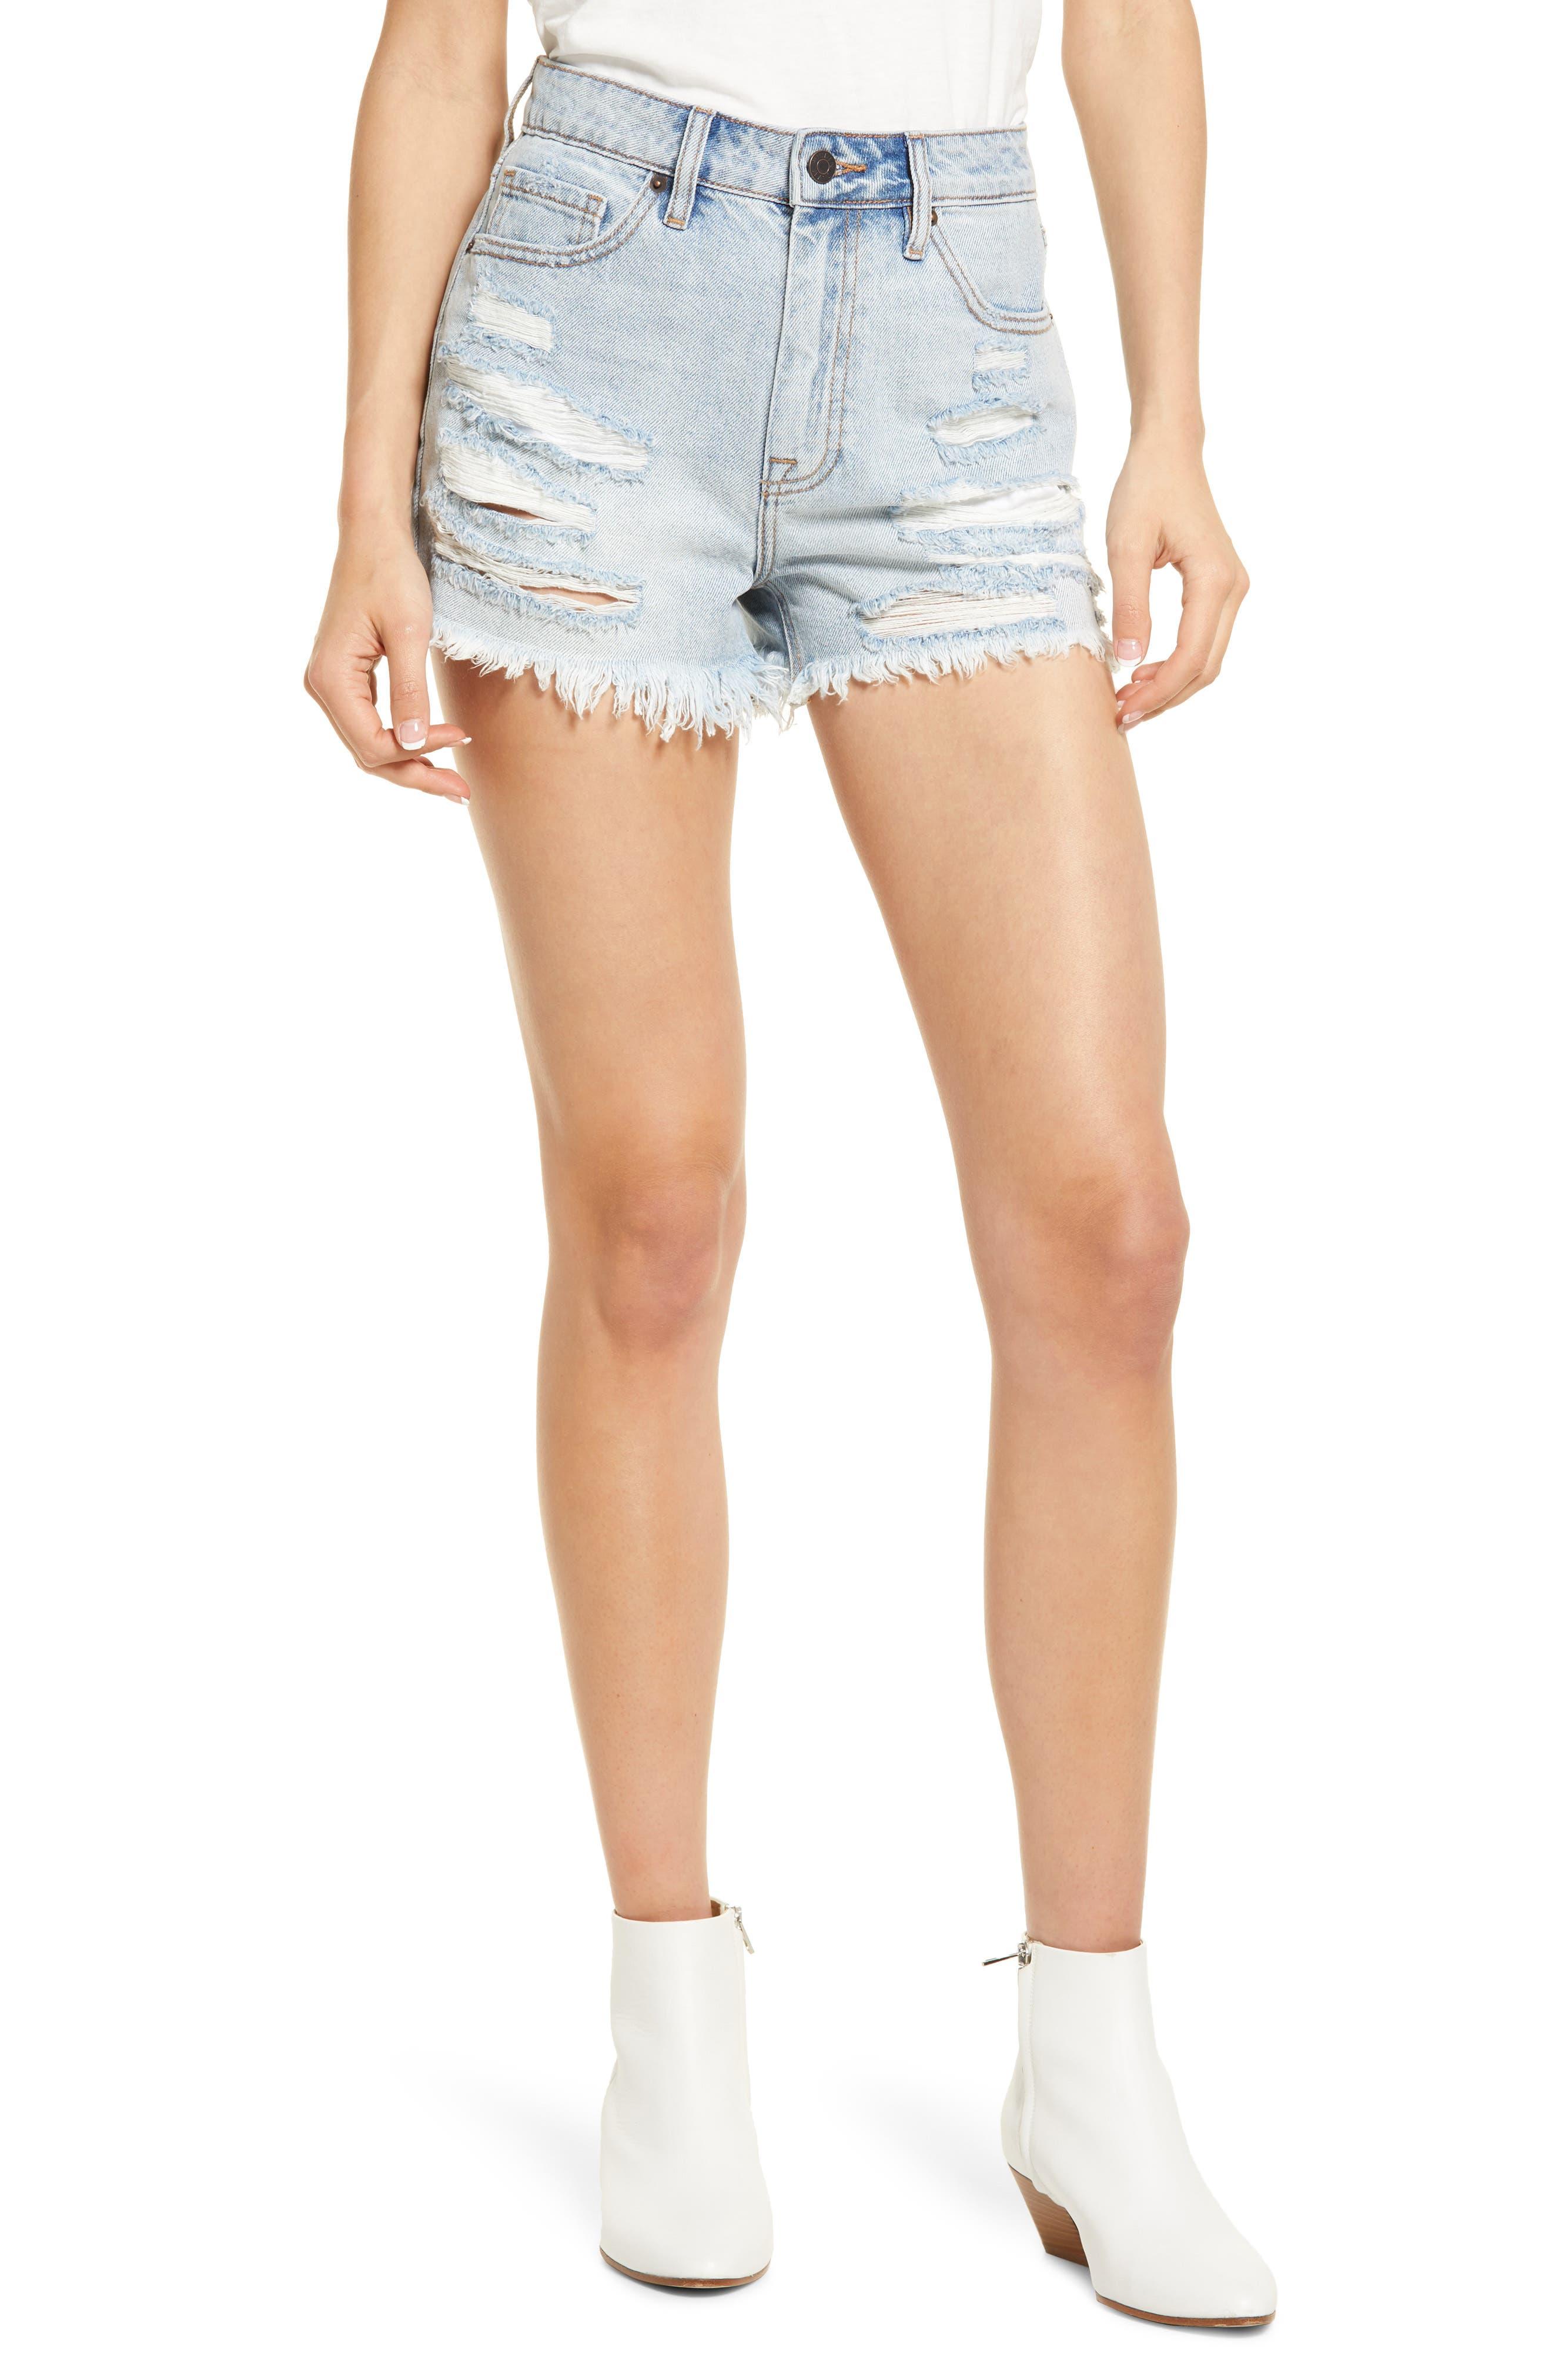 Nonstretch Distressed High Waist Denim Cutoff Shorts